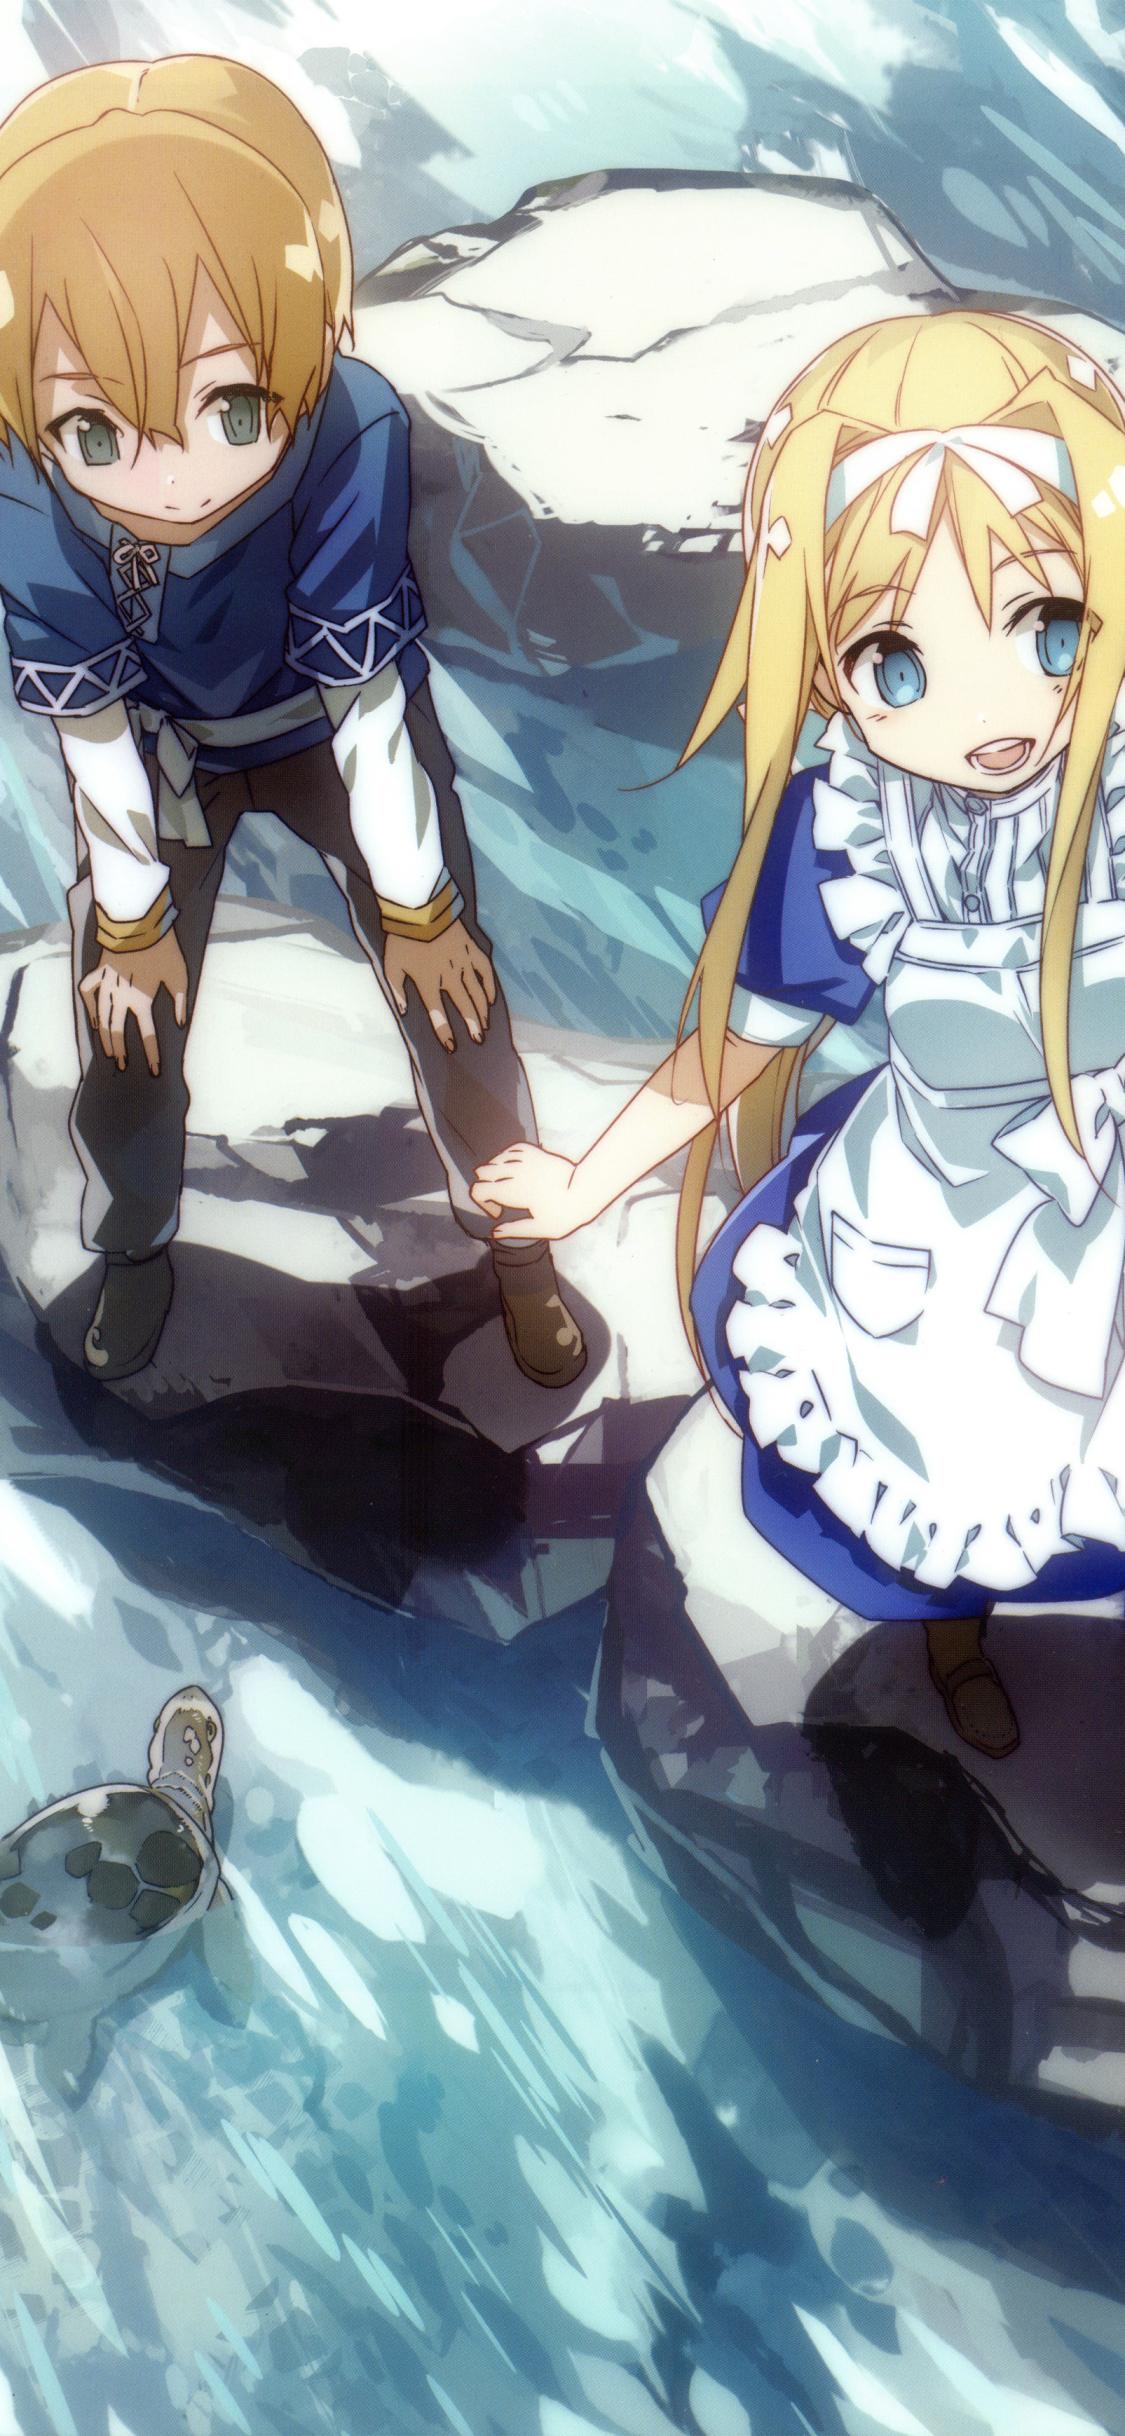 Anime Sword Art Online Alicization 1125x2436 Wallpaper Id